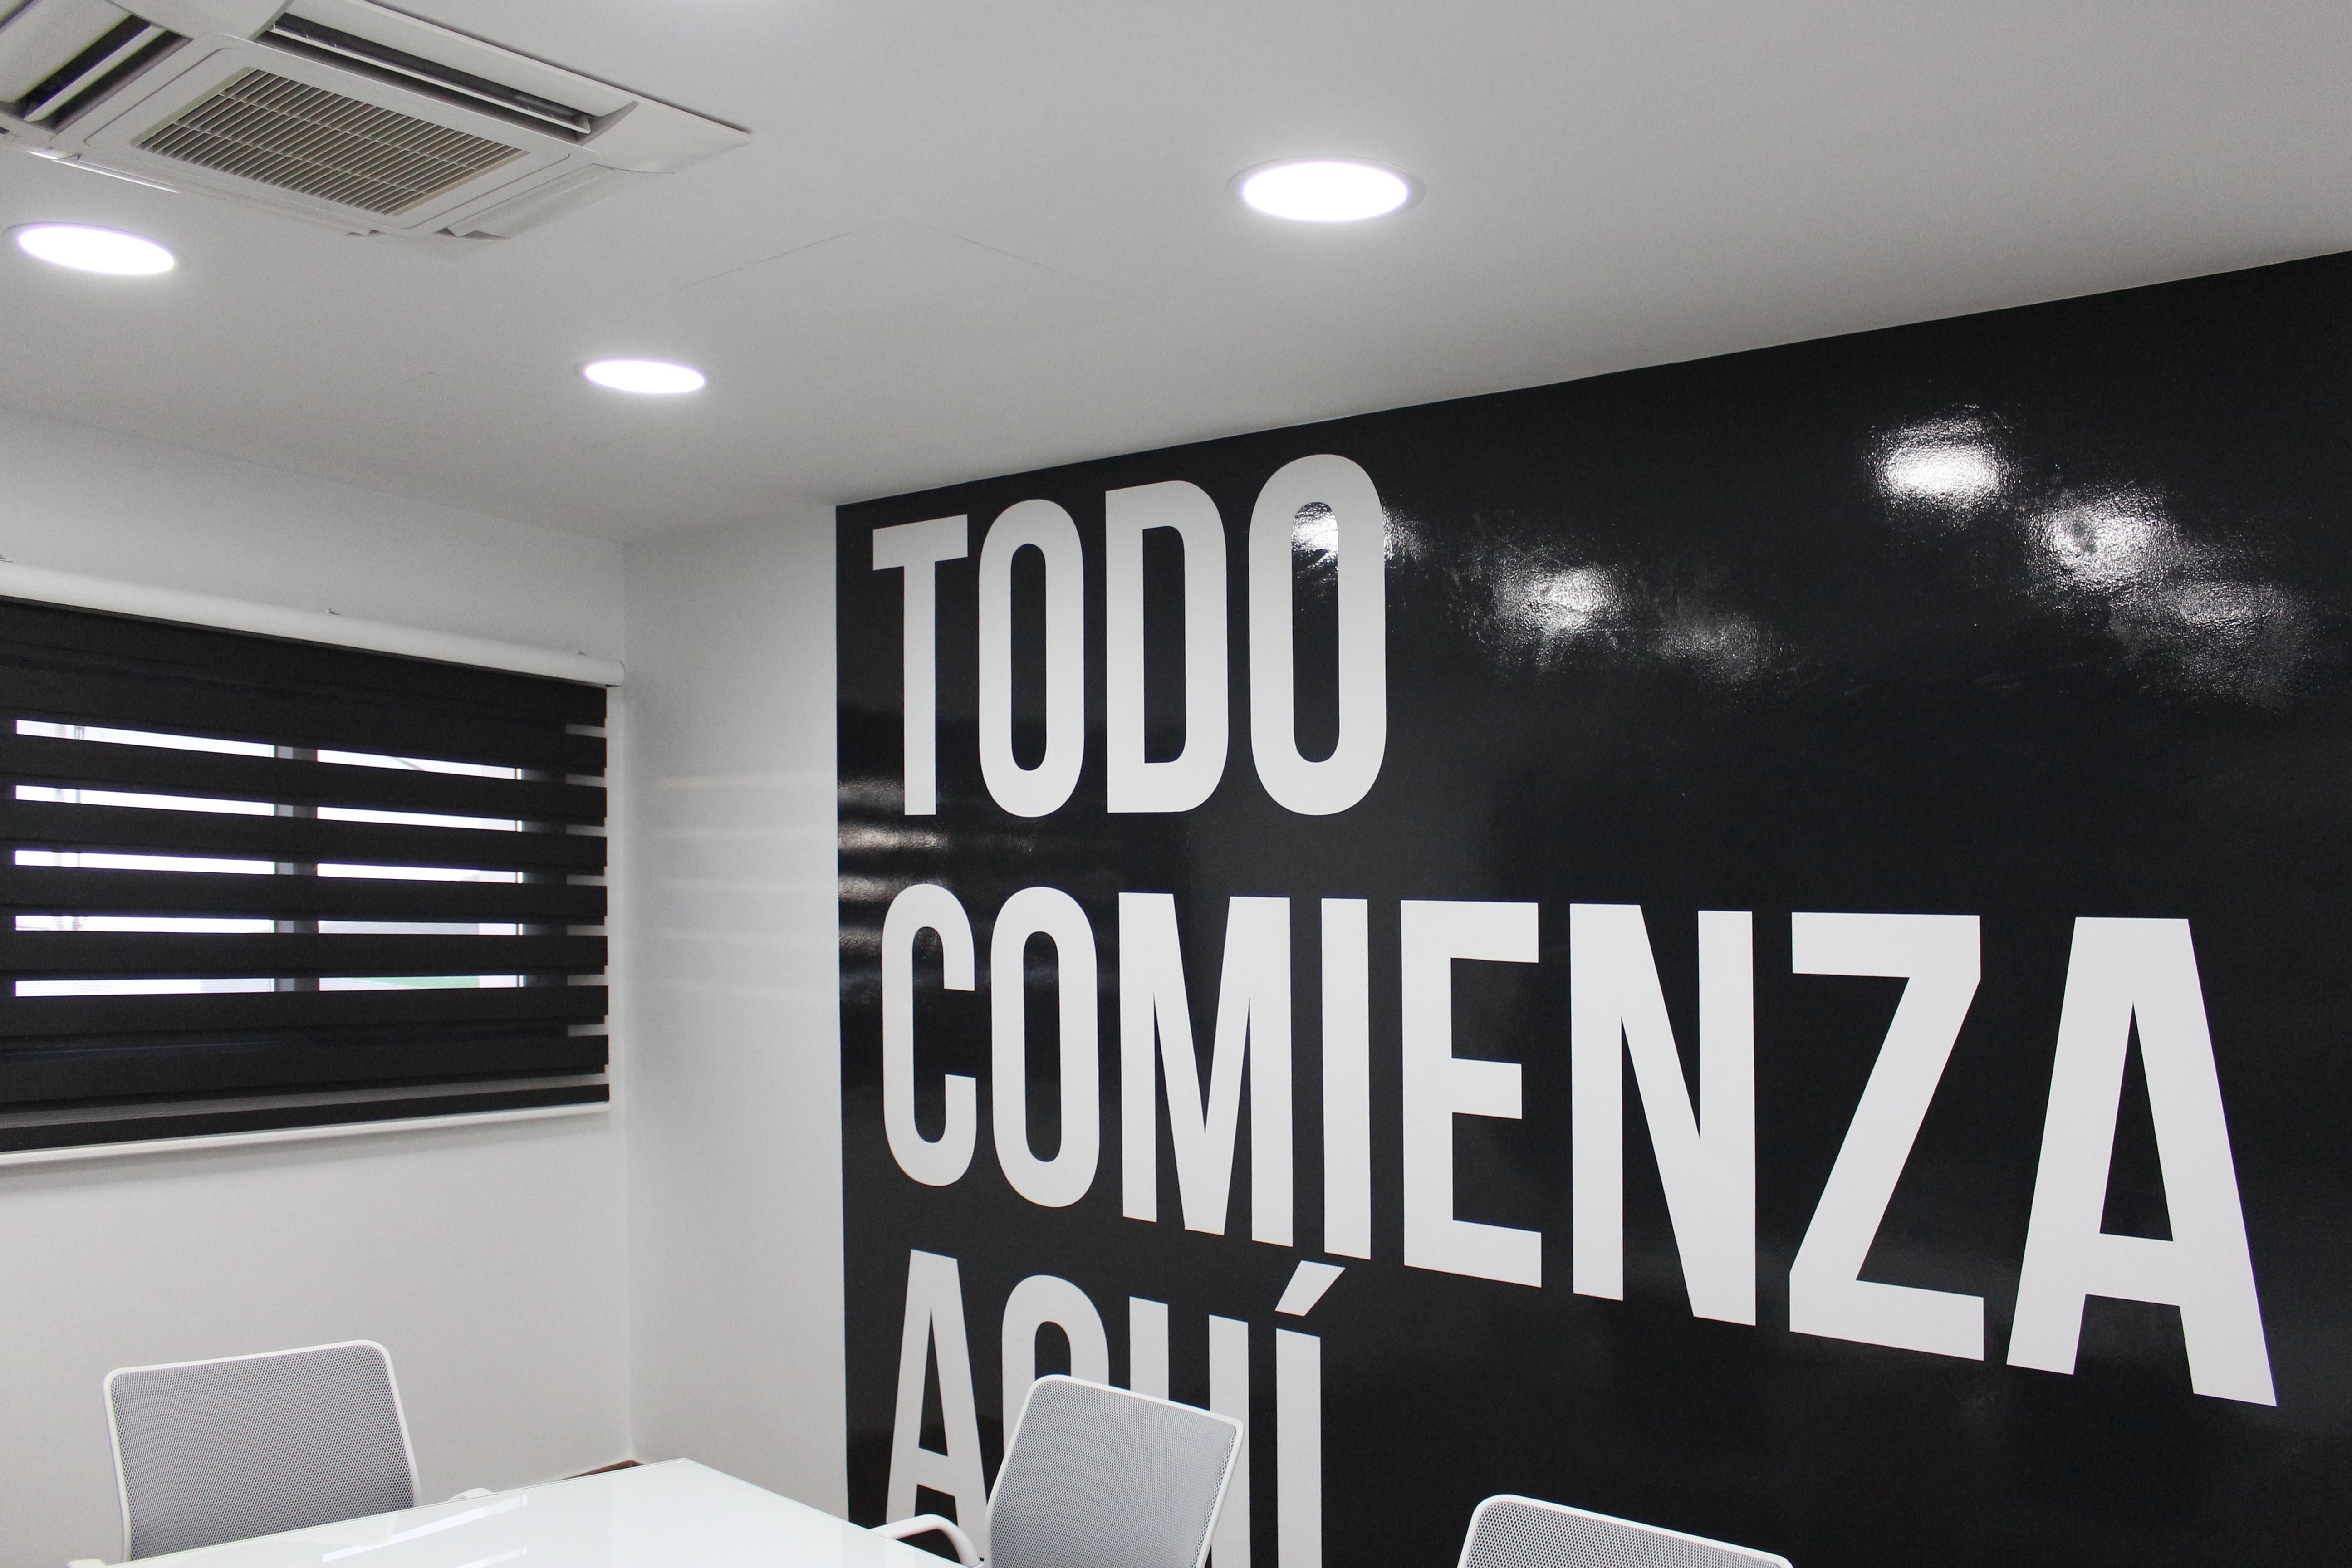 Vinilo impreso en tintas látex, Atelier Coworking, Tacoronte, Tenerife